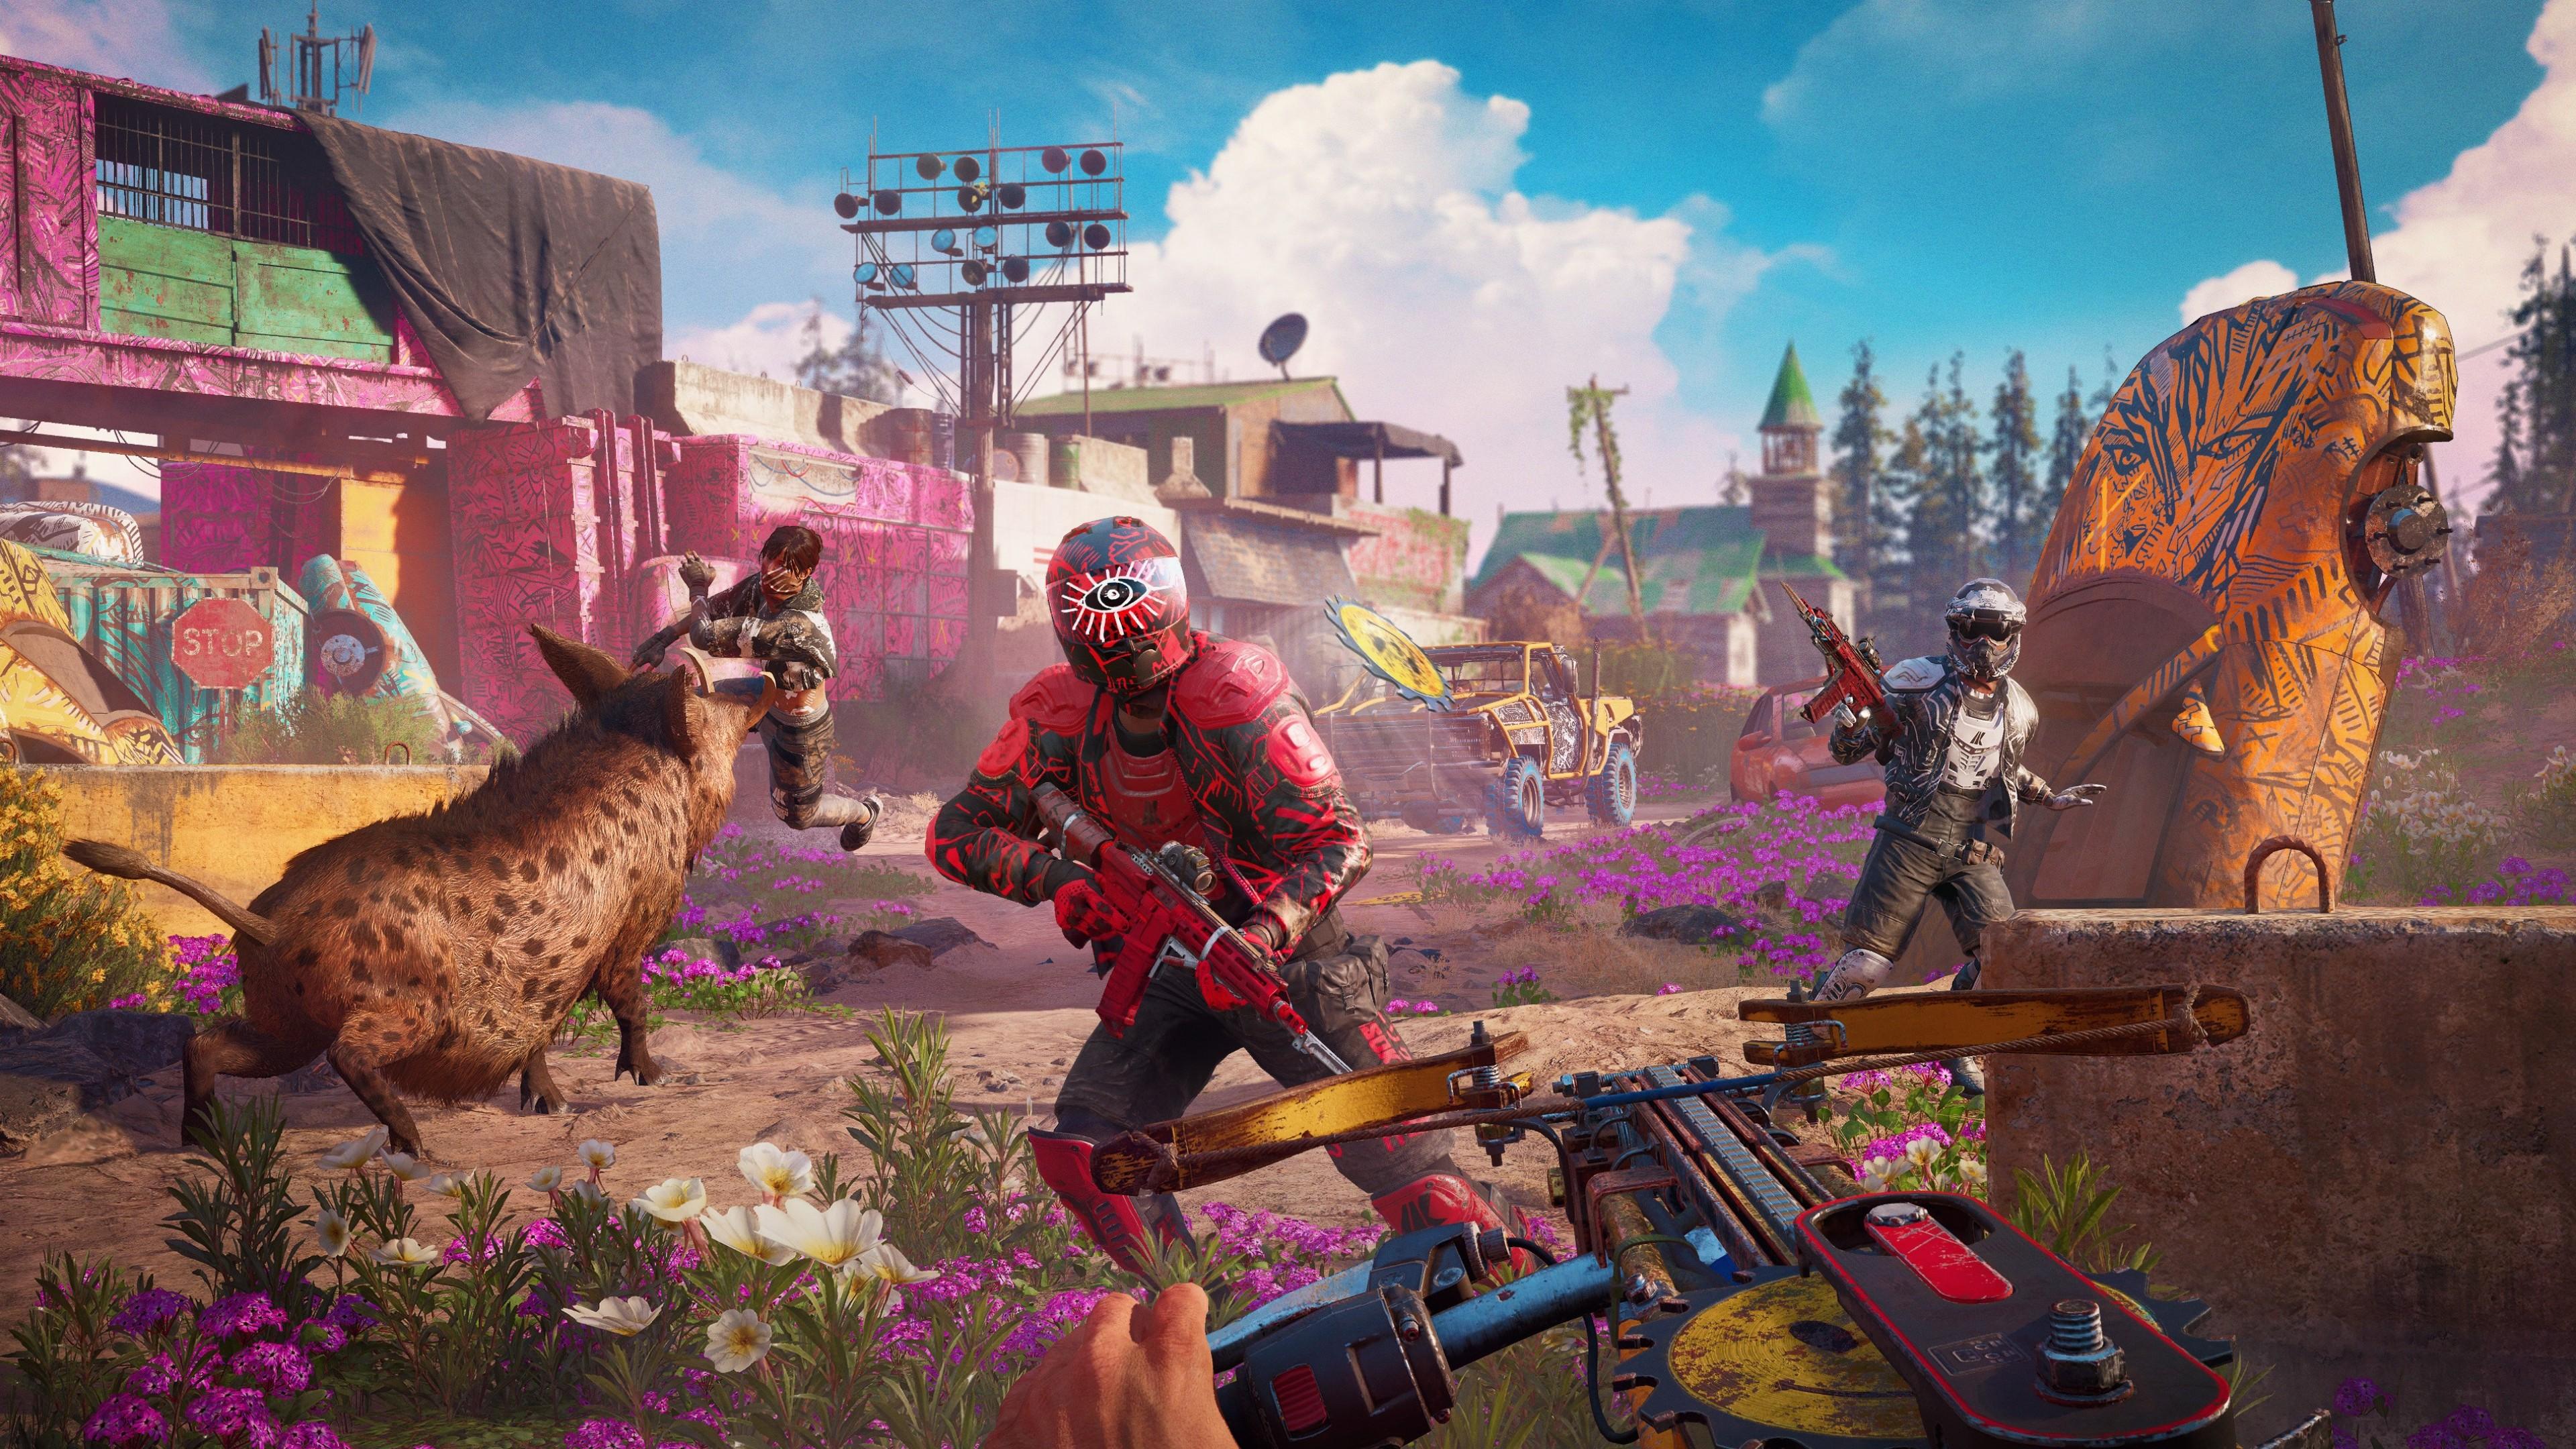 Wallpaper Far Cry New Dawn Video Games Ubisoft 3840x2160